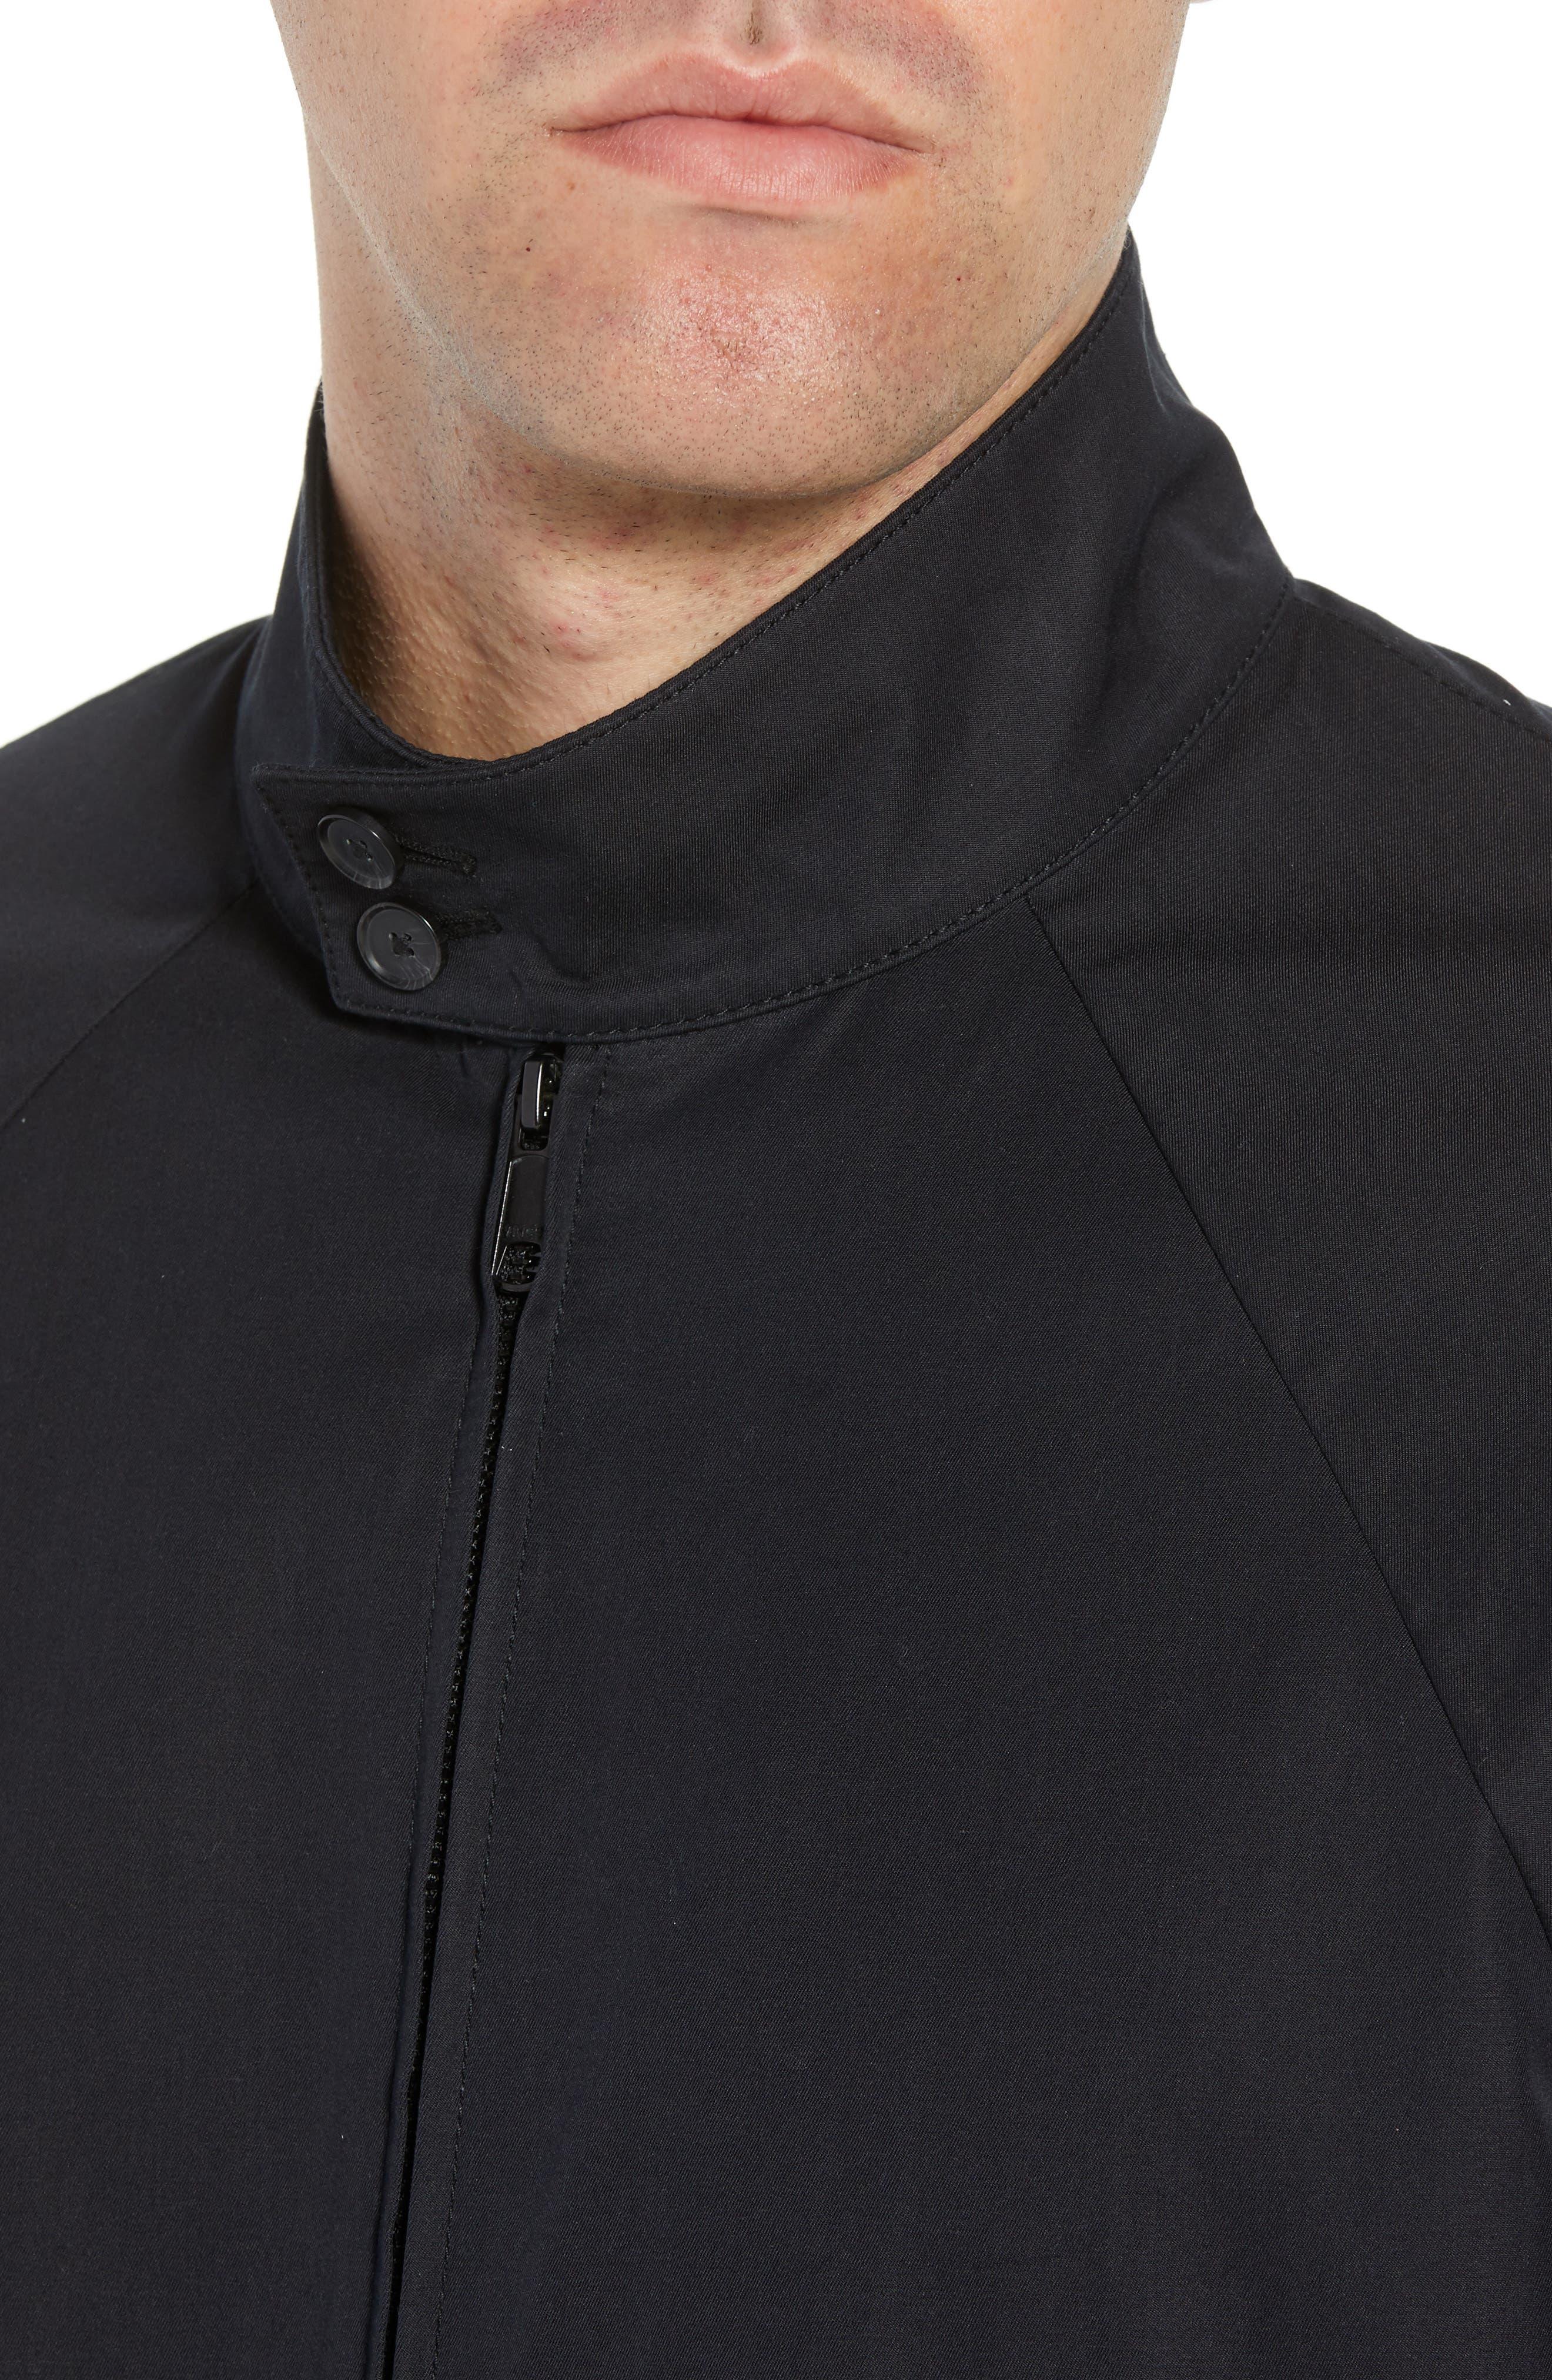 Regular Fit Jacket,                             Alternate thumbnail 4, color,                             001